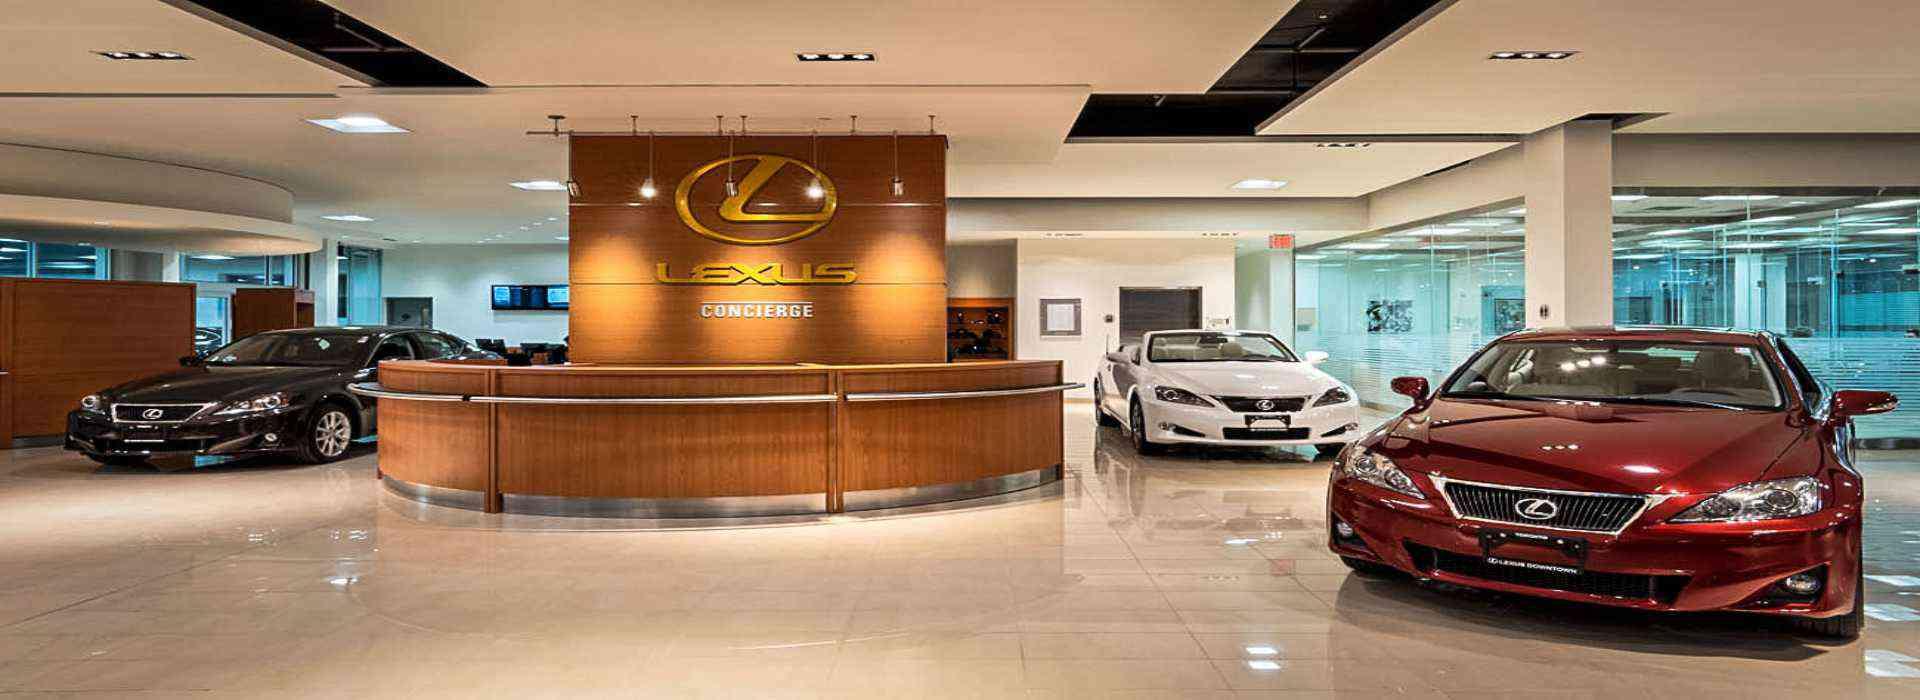 Lexus Customer Service Number UK, Head Office Address  CustomerServiceDirectory